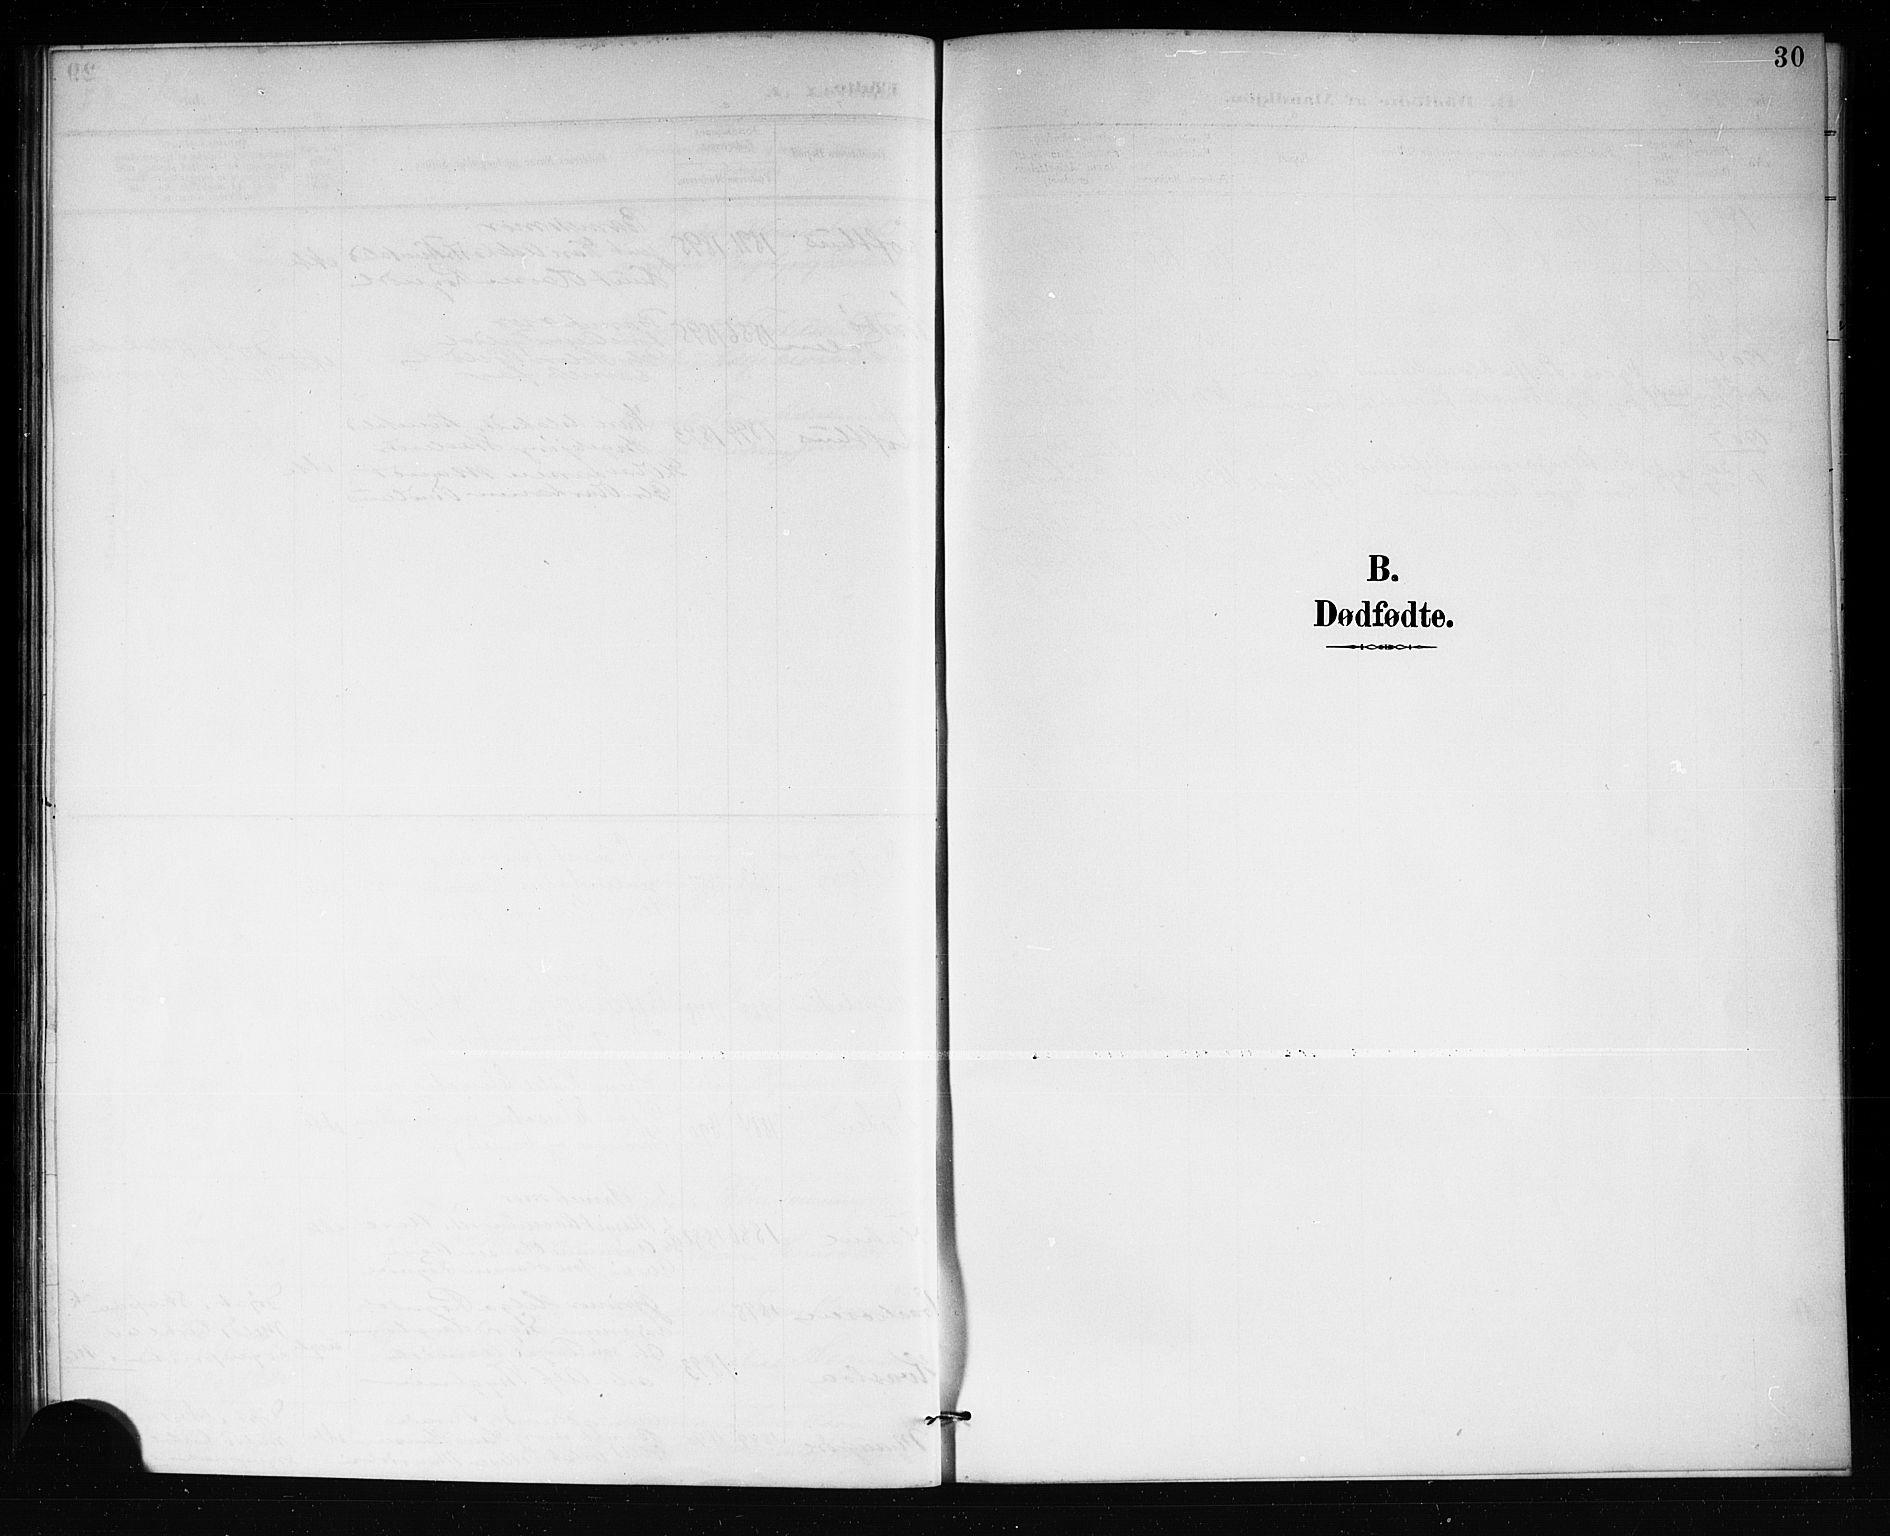 SAKO, Lårdal kirkebøker, G/Gb/L0003: Klokkerbok nr. II 3, 1889-1920, s. 30